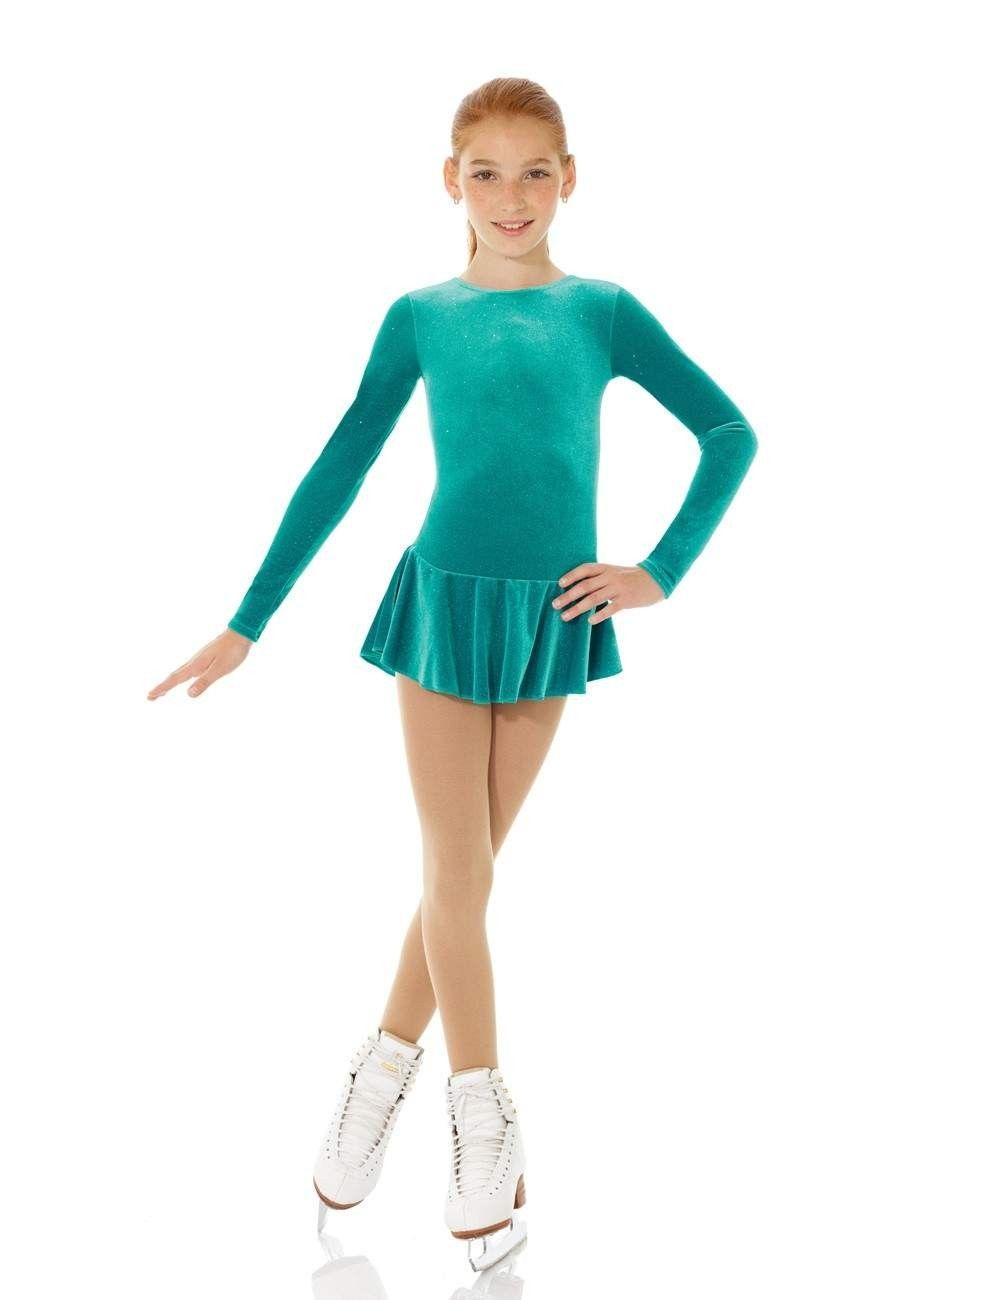 79da969ee7fd Born to Skate Glitter Dress Mondor (2711) Child. Born to Skate Glitter Dress  Mondor (2711) Child Ice Dance, Figure Skating Dresses